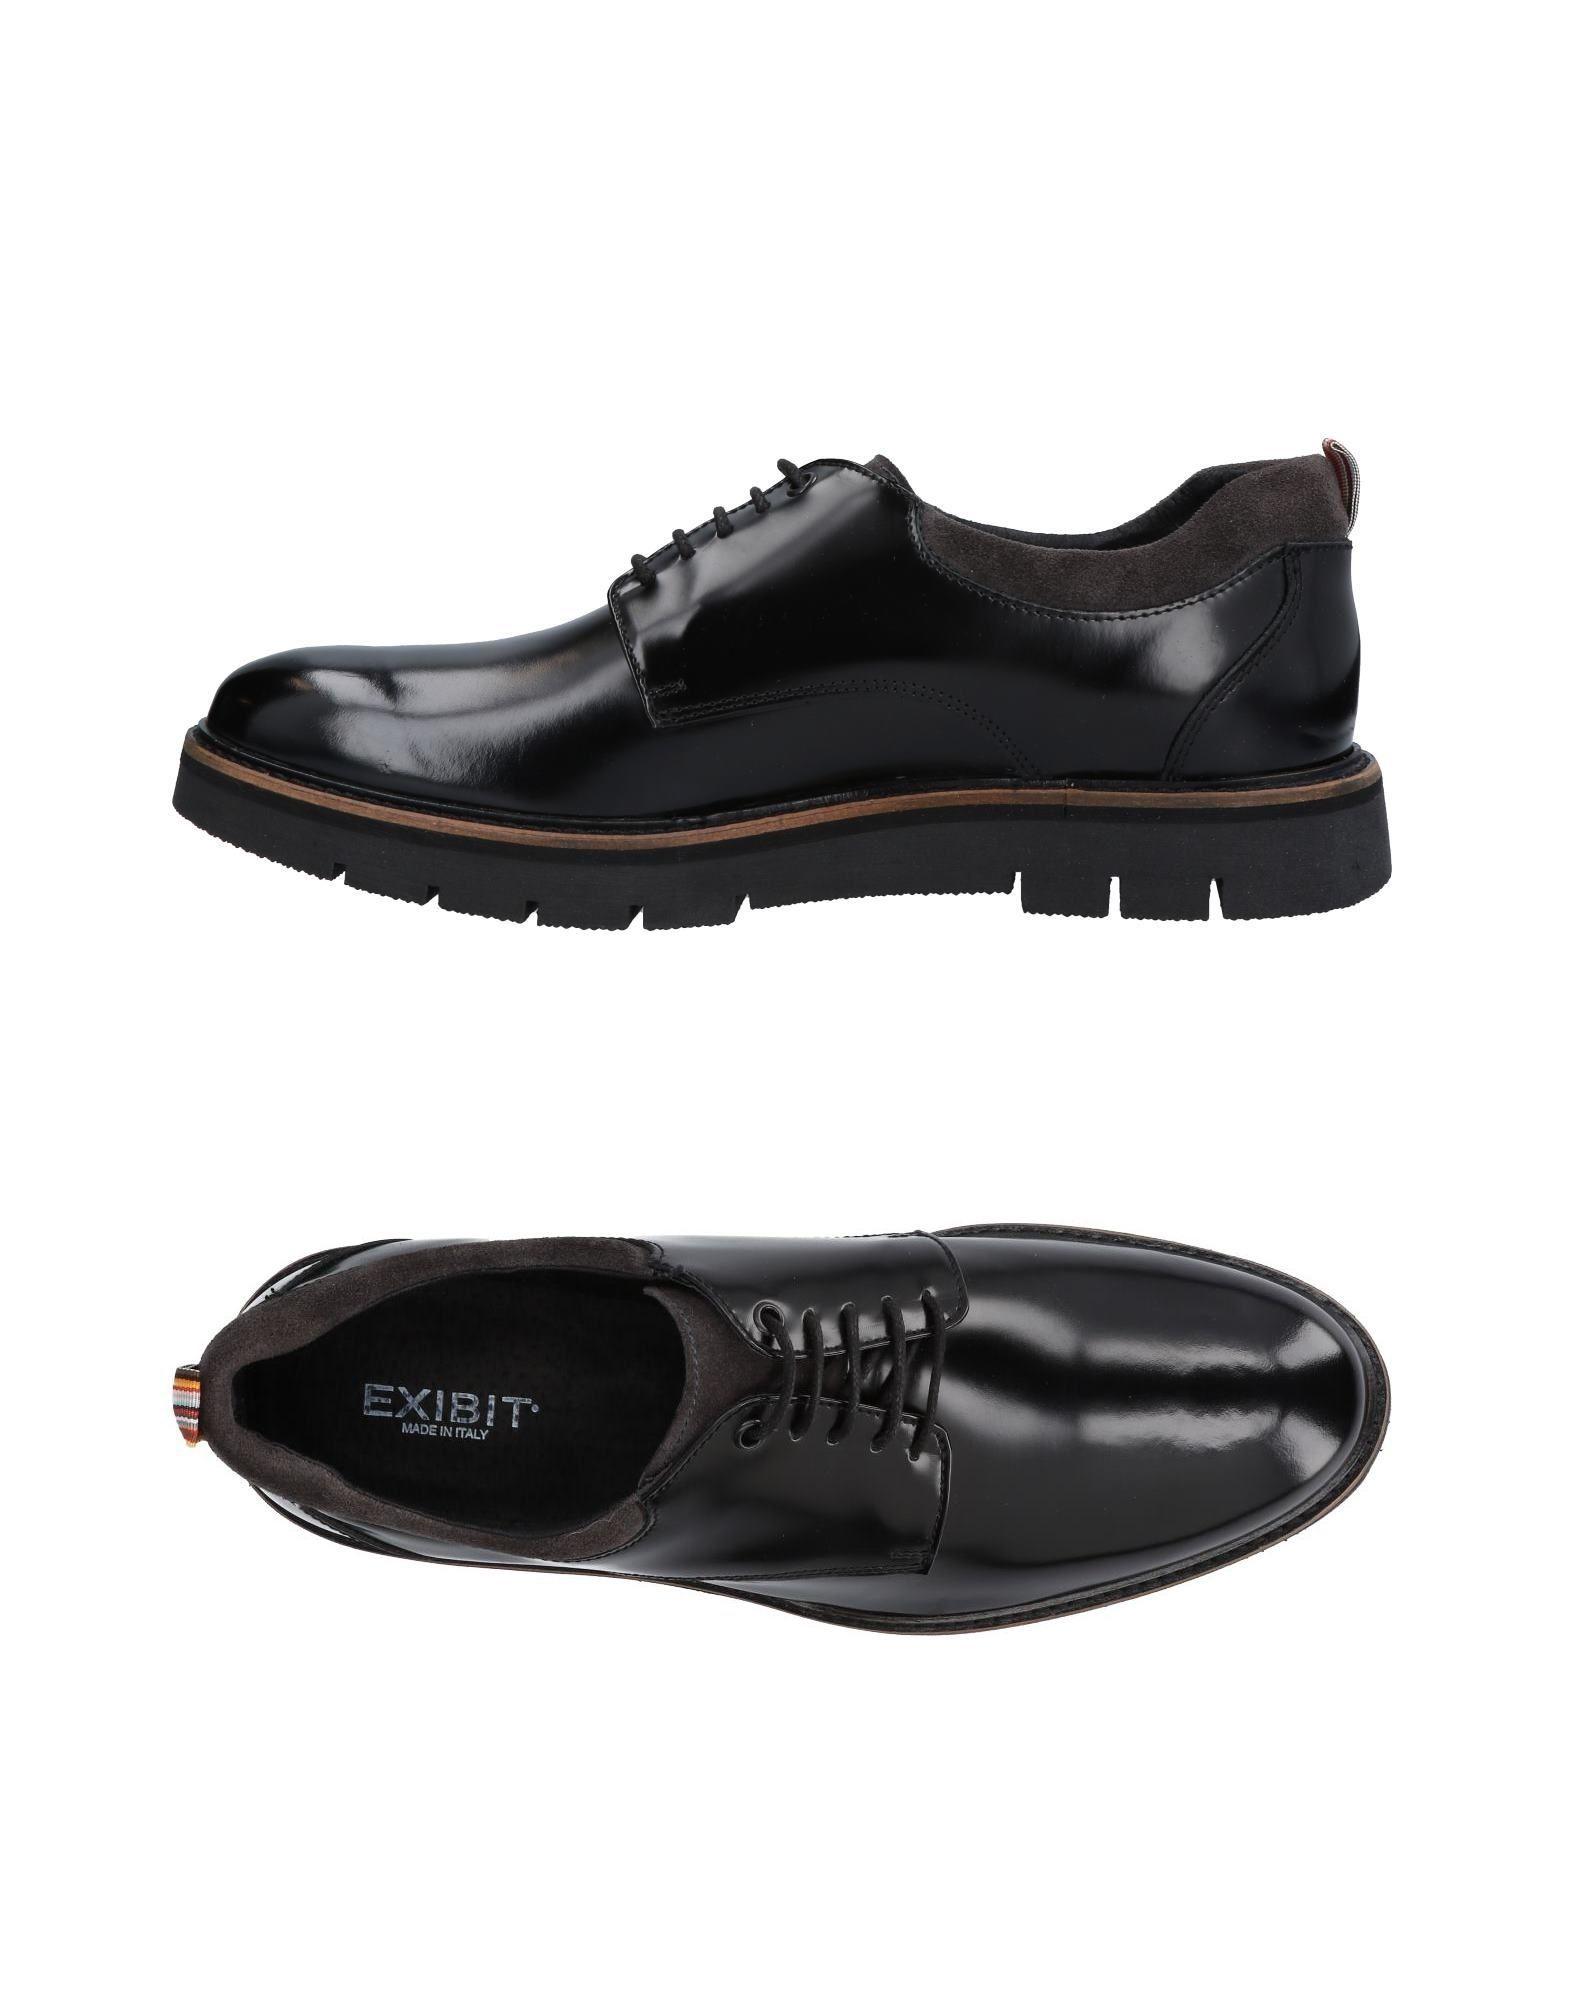 Rabatt echte Schuhe Exibit Schnürschuhe Herren  11465186DL